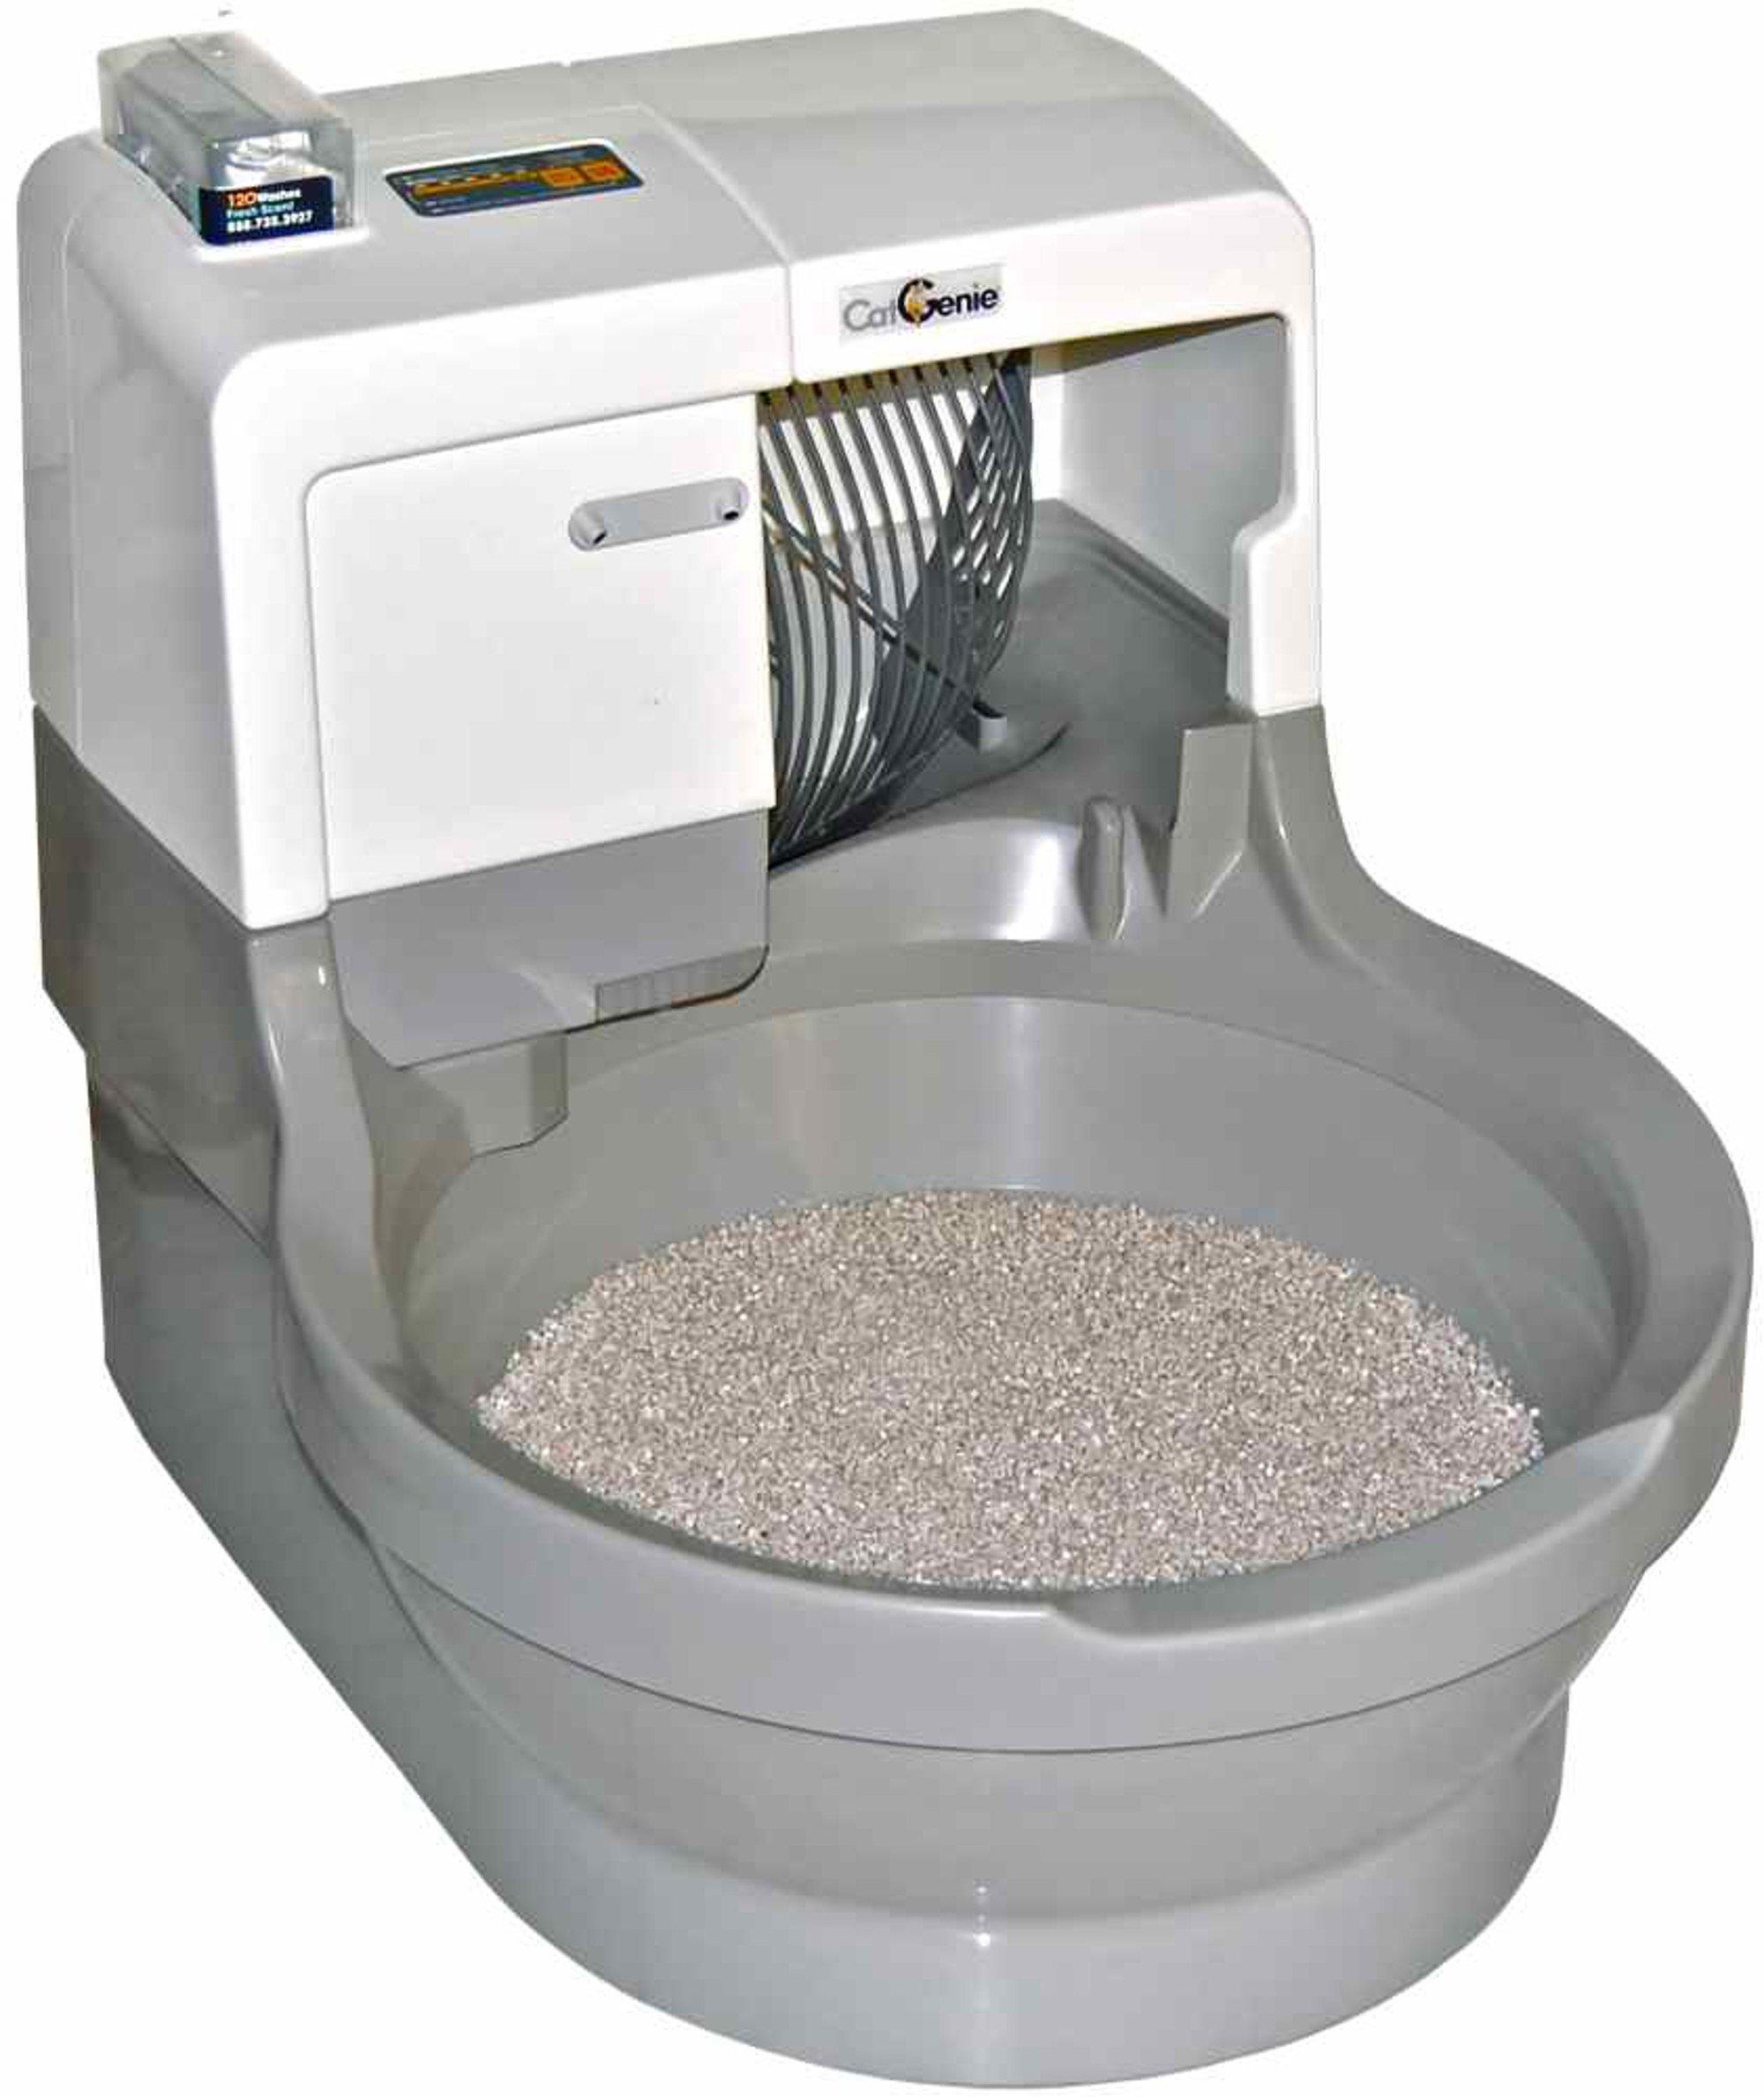 CatGenie Self Washing Self Flushing Cat Box by CatGenie